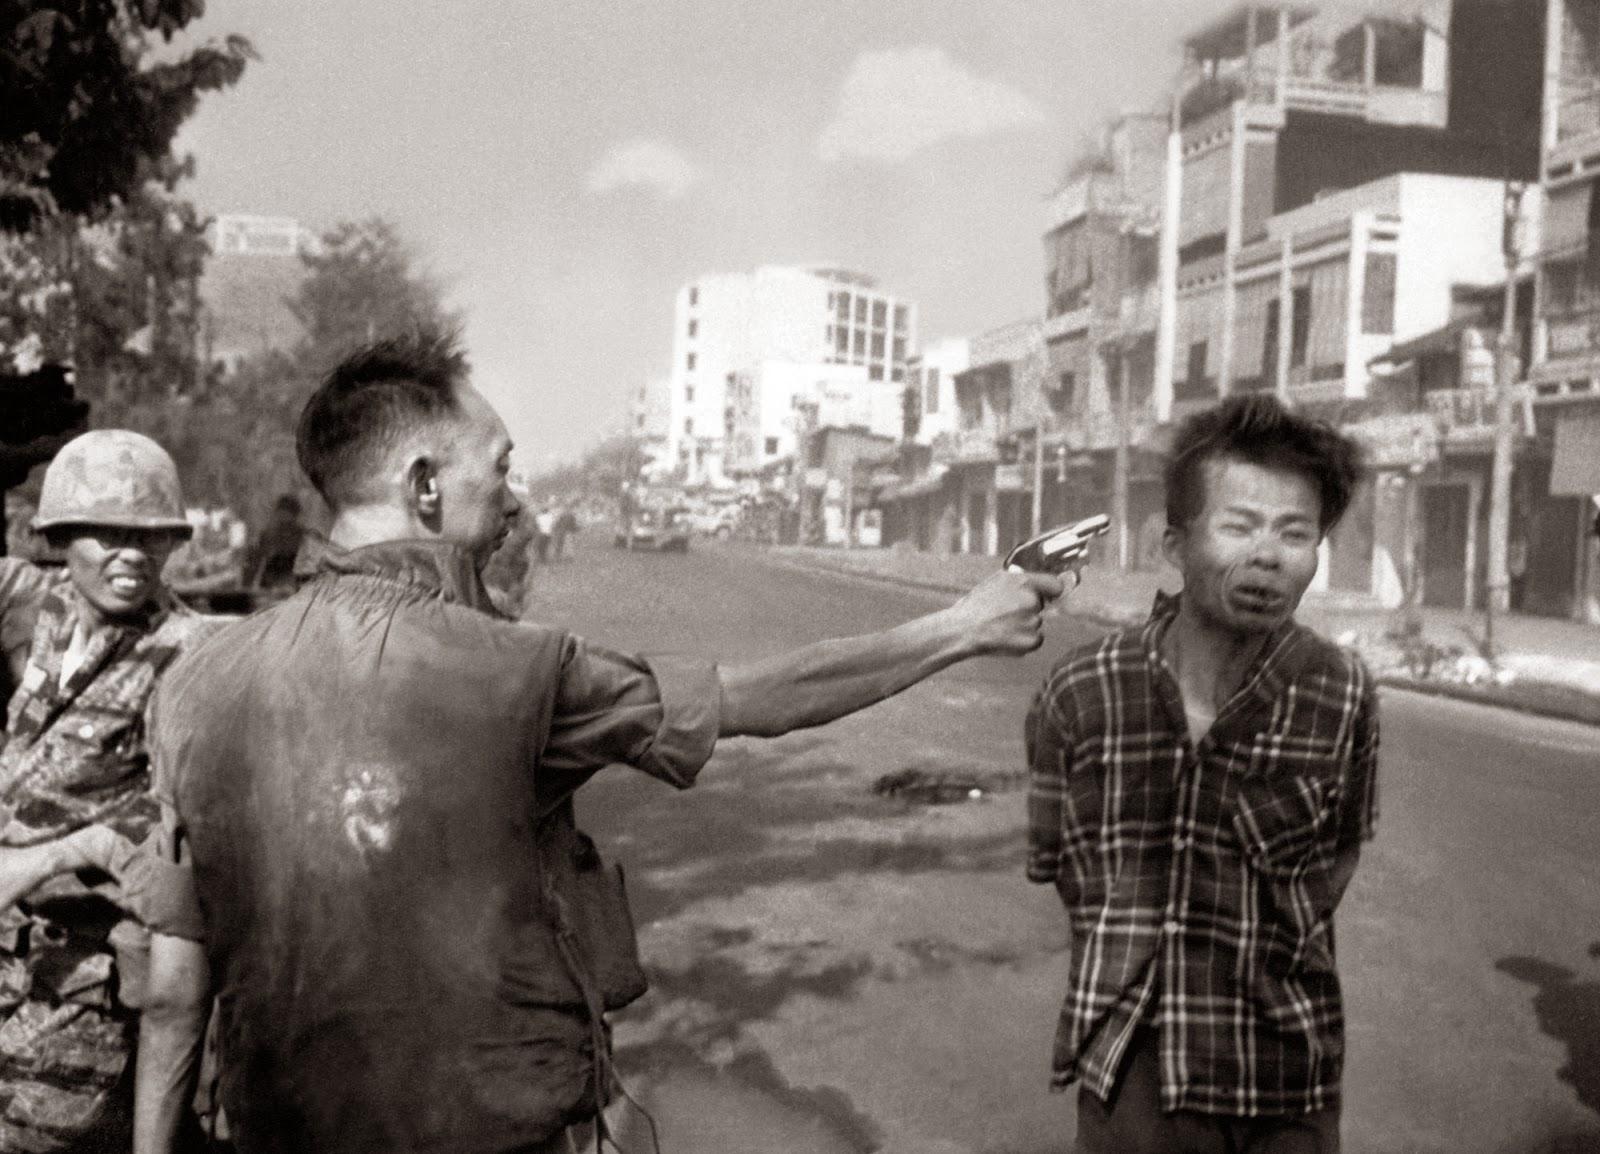 L'exécution du Viet-Cong © Eddie Adams 1968